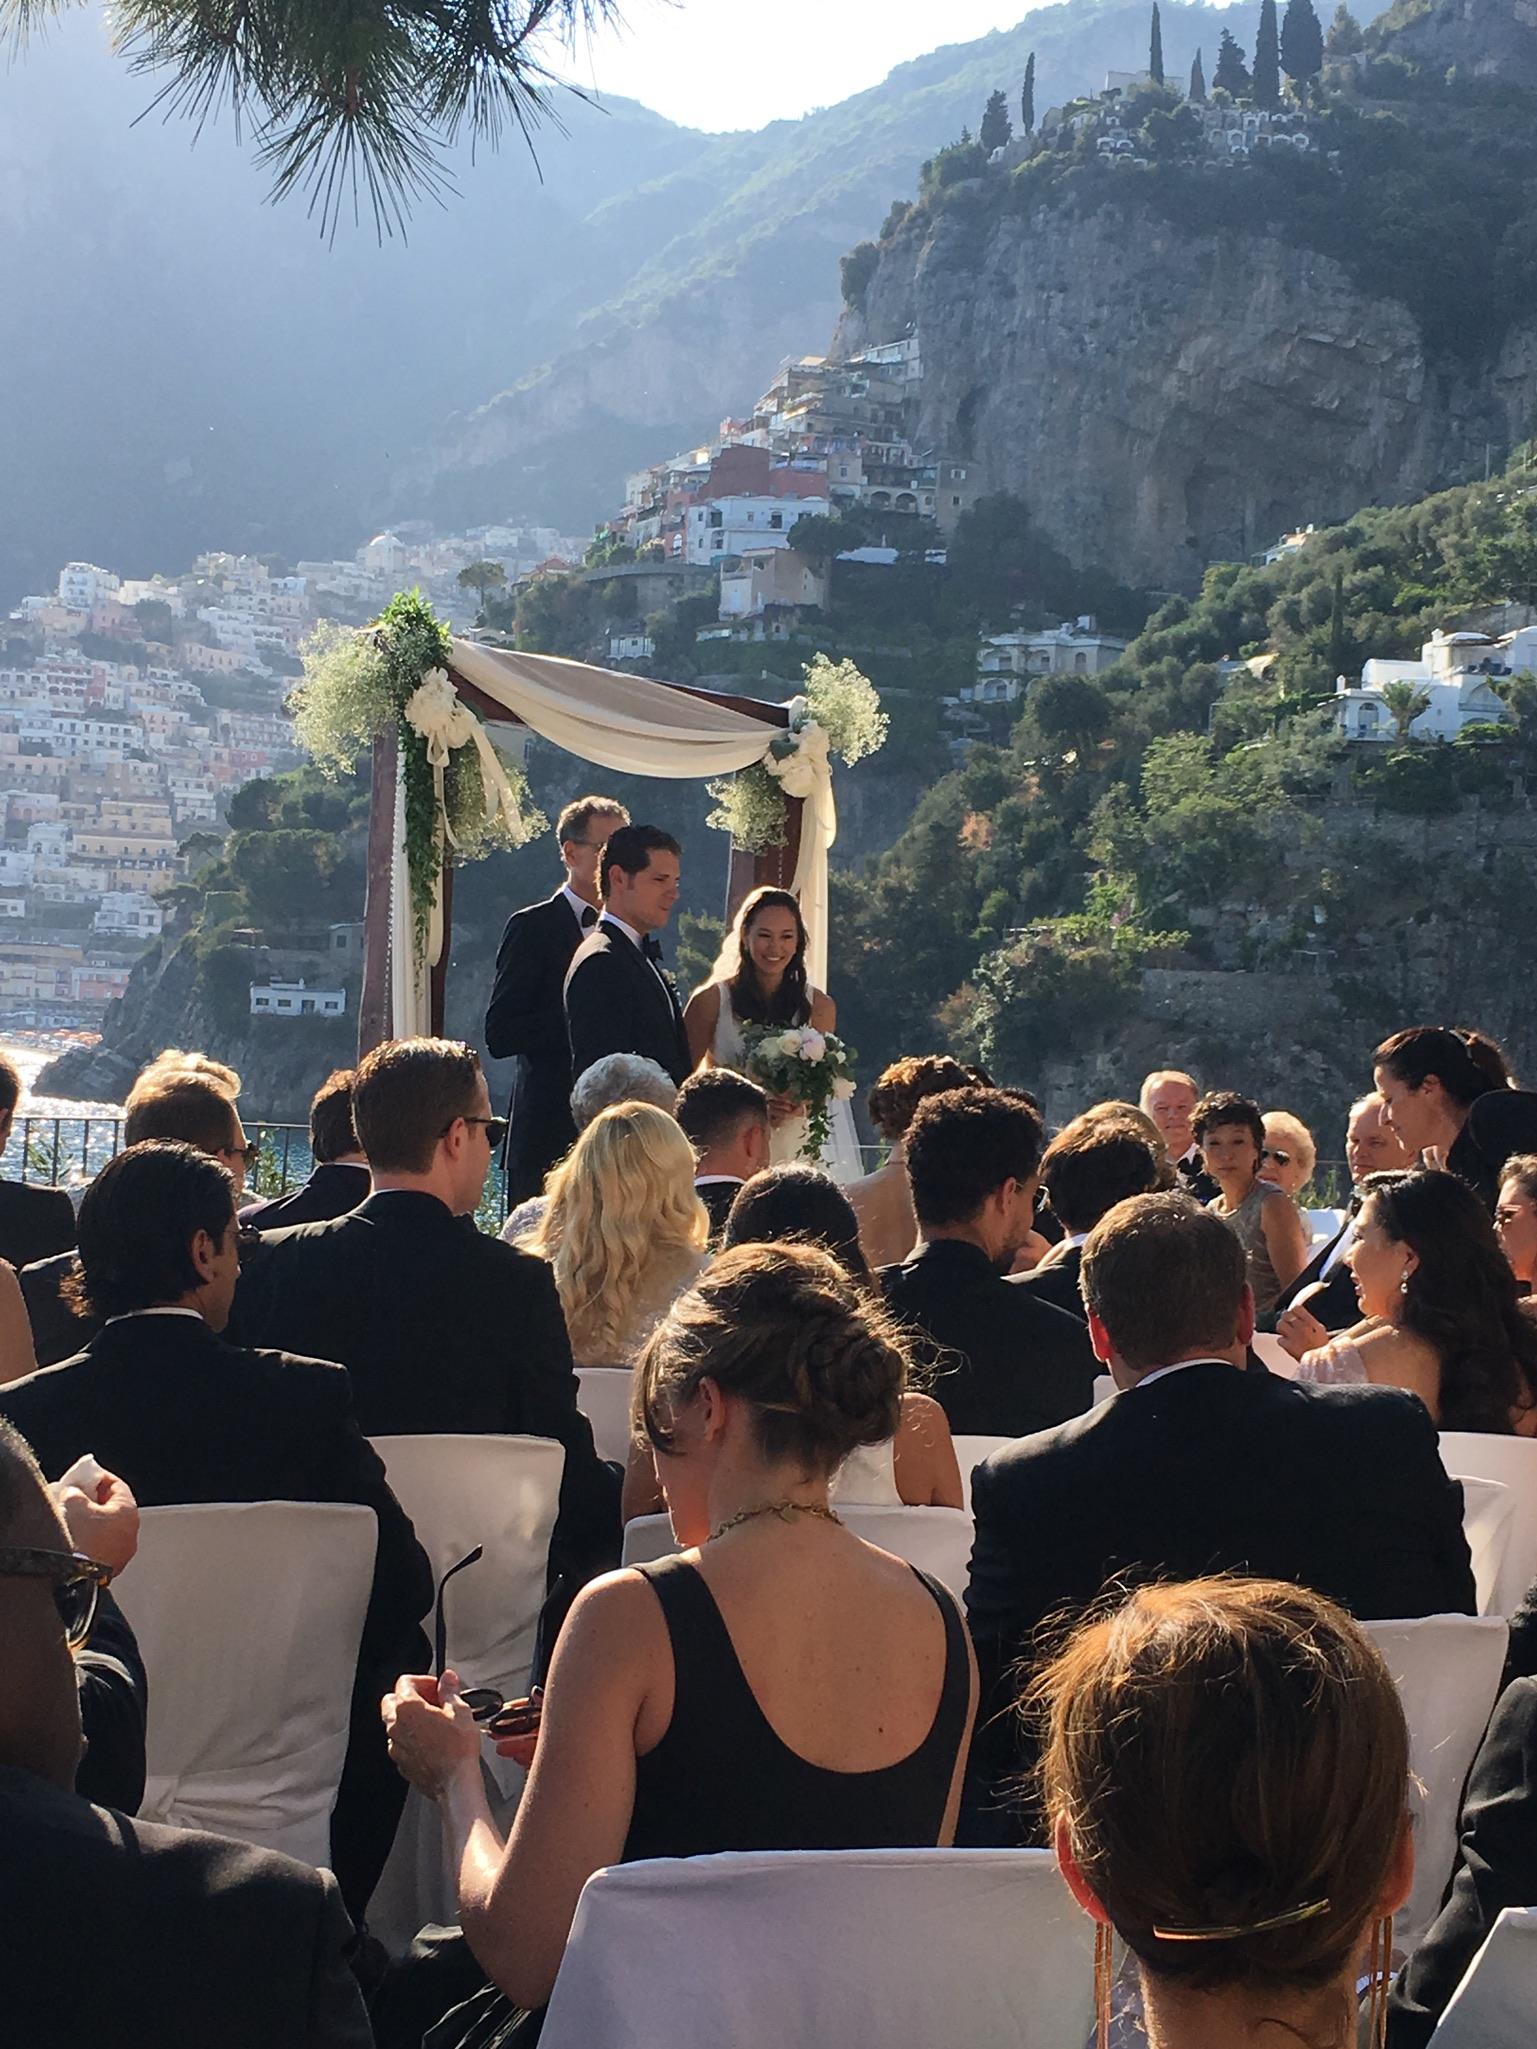 http://www.weddingamalfi.com/wp-content/uploads/Nathalie-and-Benjamin-Wedding-in-Positano-Italy-4.jpg